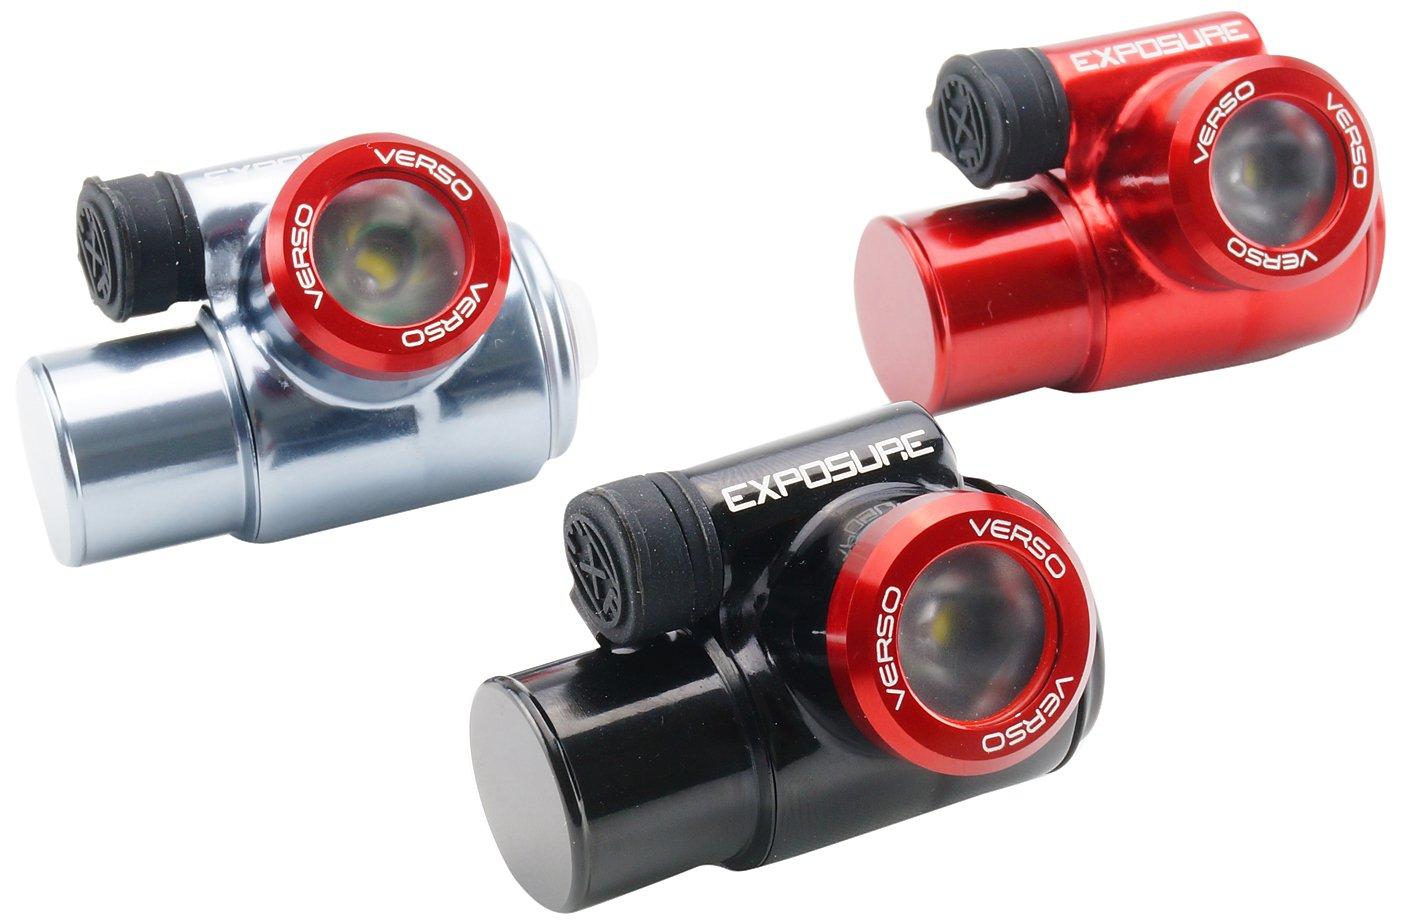 Exposure Lights Stirnlampen Verso: Ultra-Kompakte Leichte Stirnlampe - Gun Metal, EXPVERSOGMG